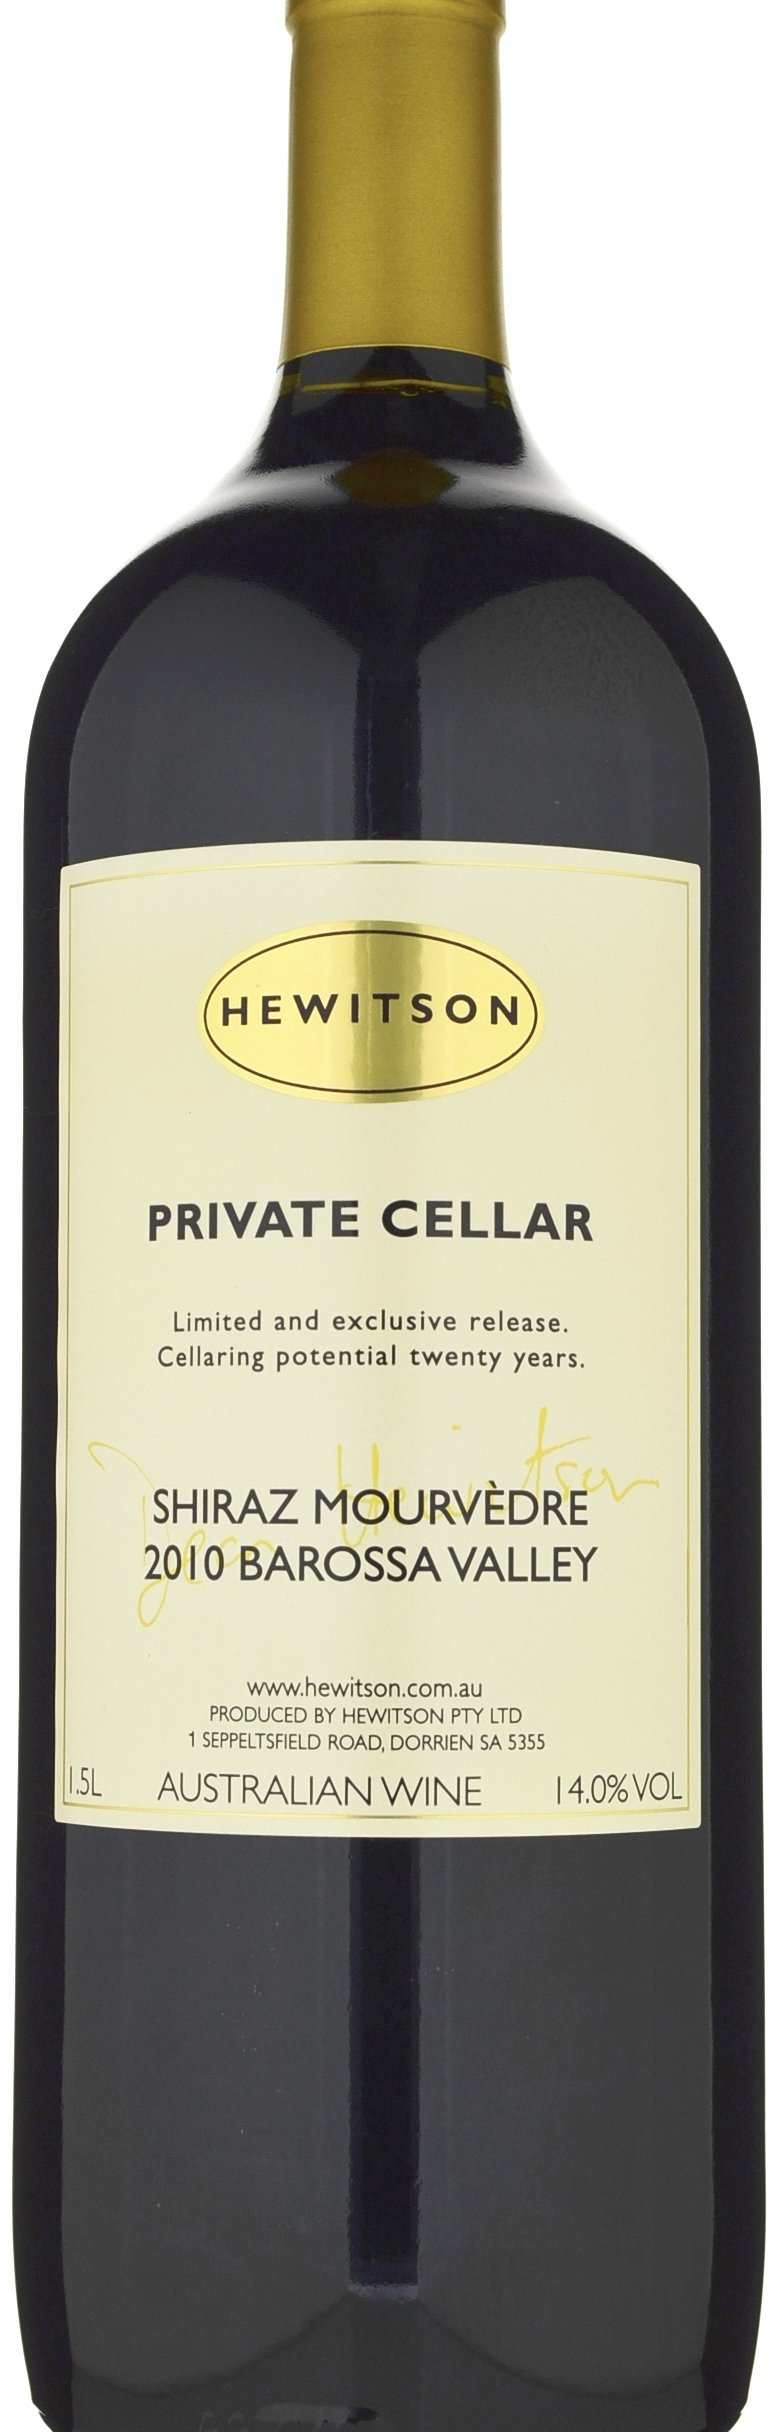 Hewitson 'Private Cellar' Shiraz-Mourvedre 2002-2327